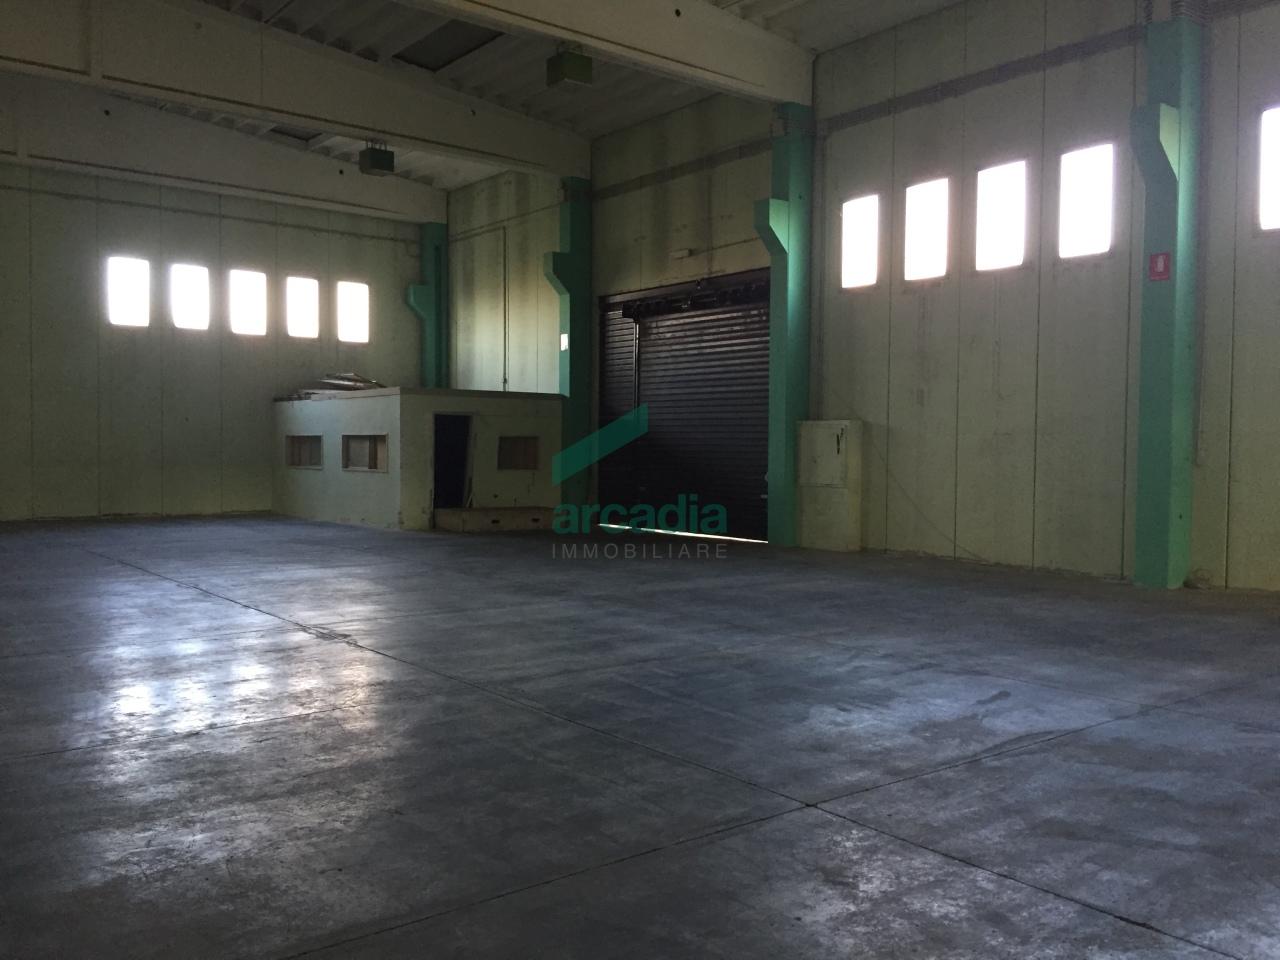 Capannone - Industriale a Bitonto Rif. 10466012